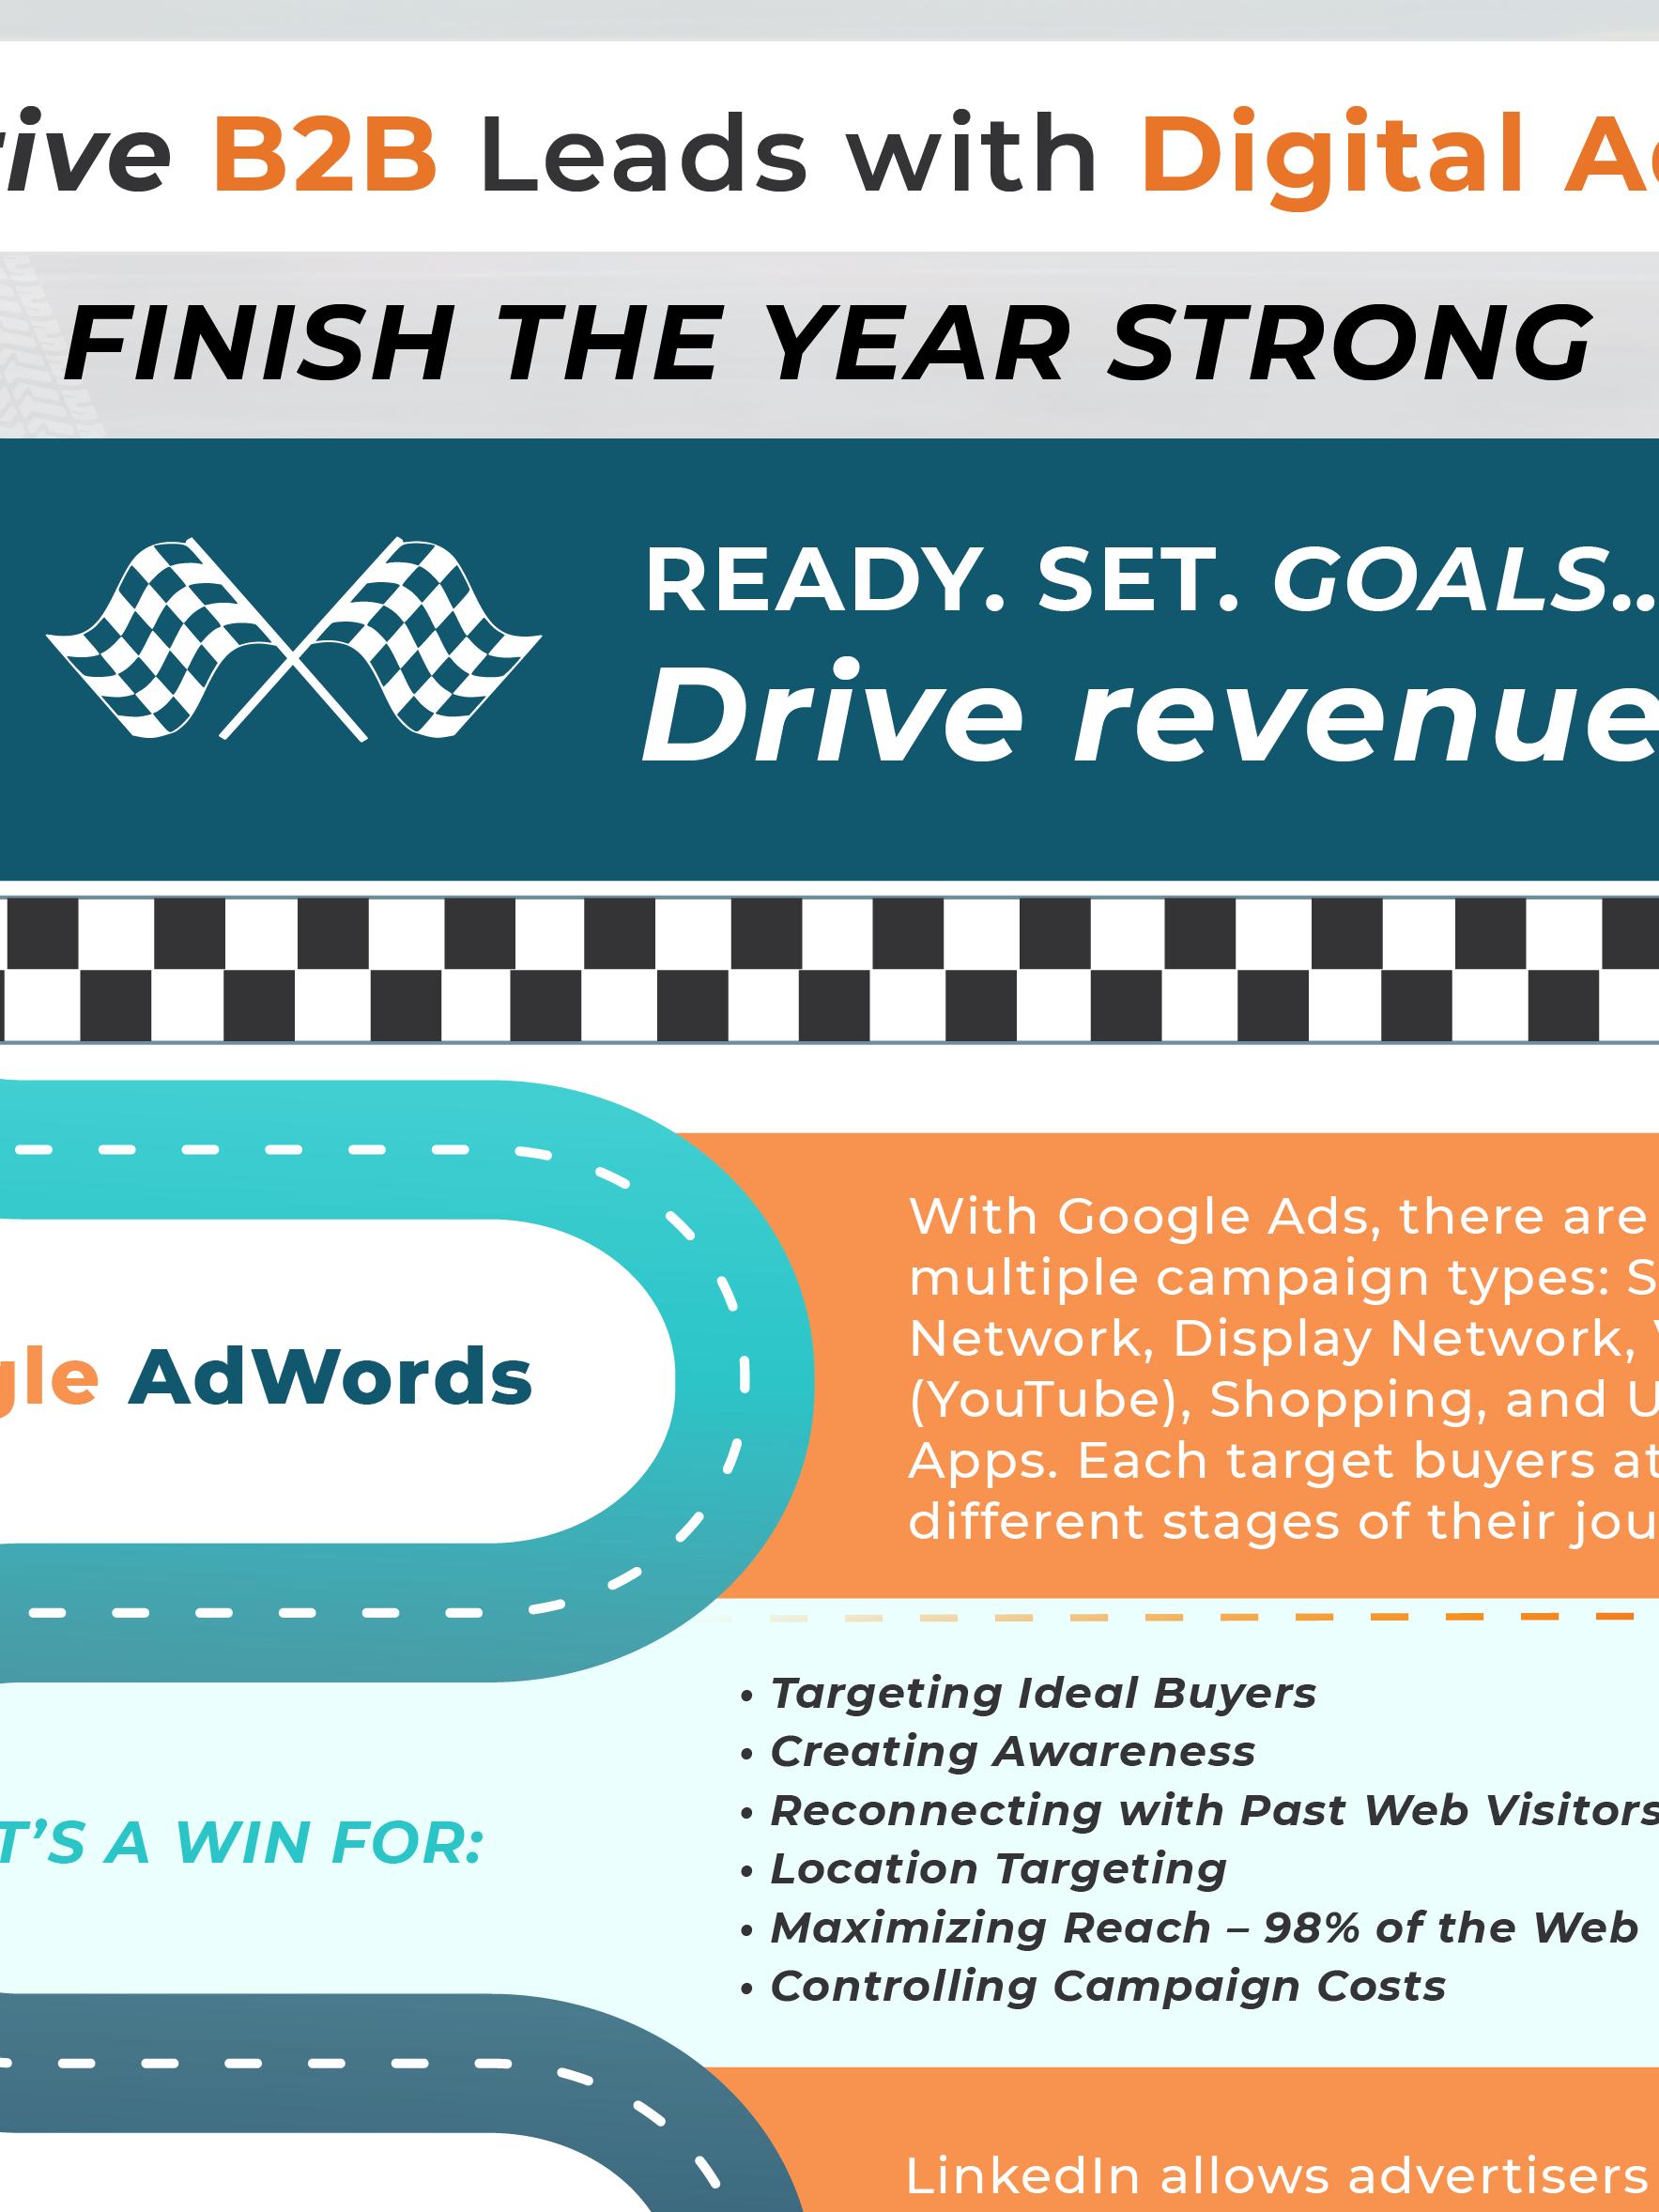 20191204_Conveyance Marketing_Drive B2B Infographic_Thumbnail (2)